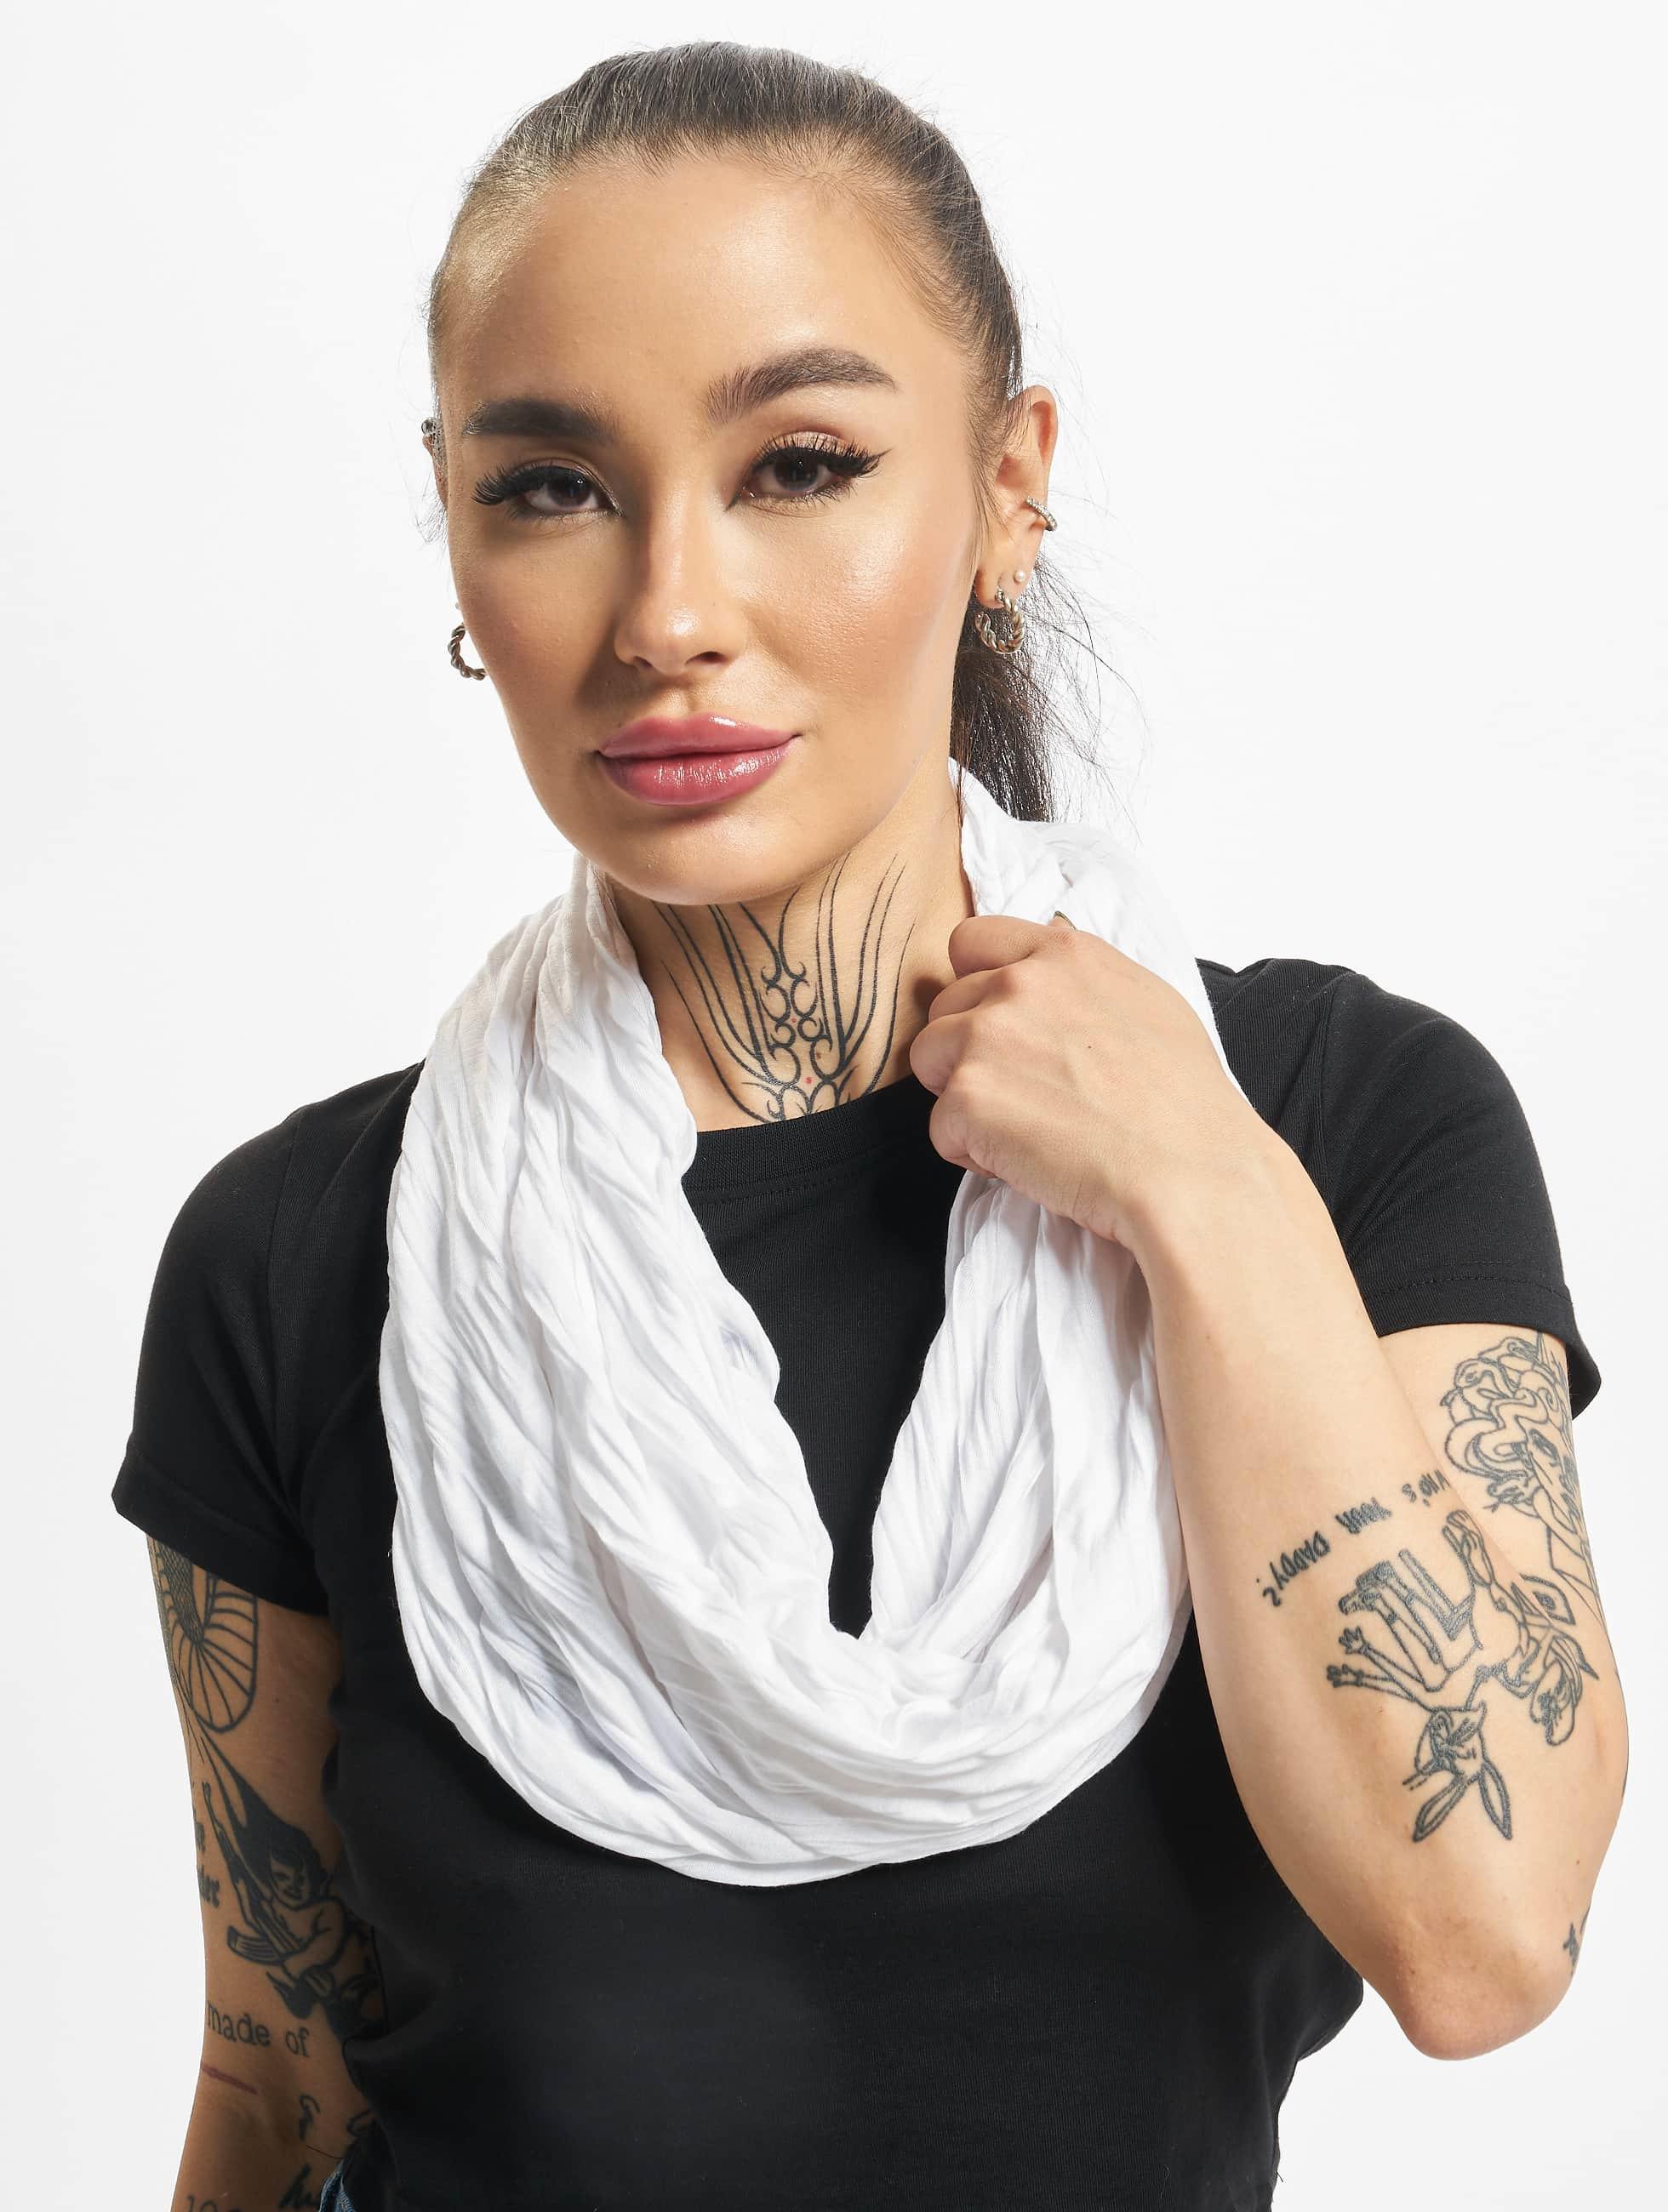 MSTRDS Männer,Frauen Schal Wrinkle Loop in weiß